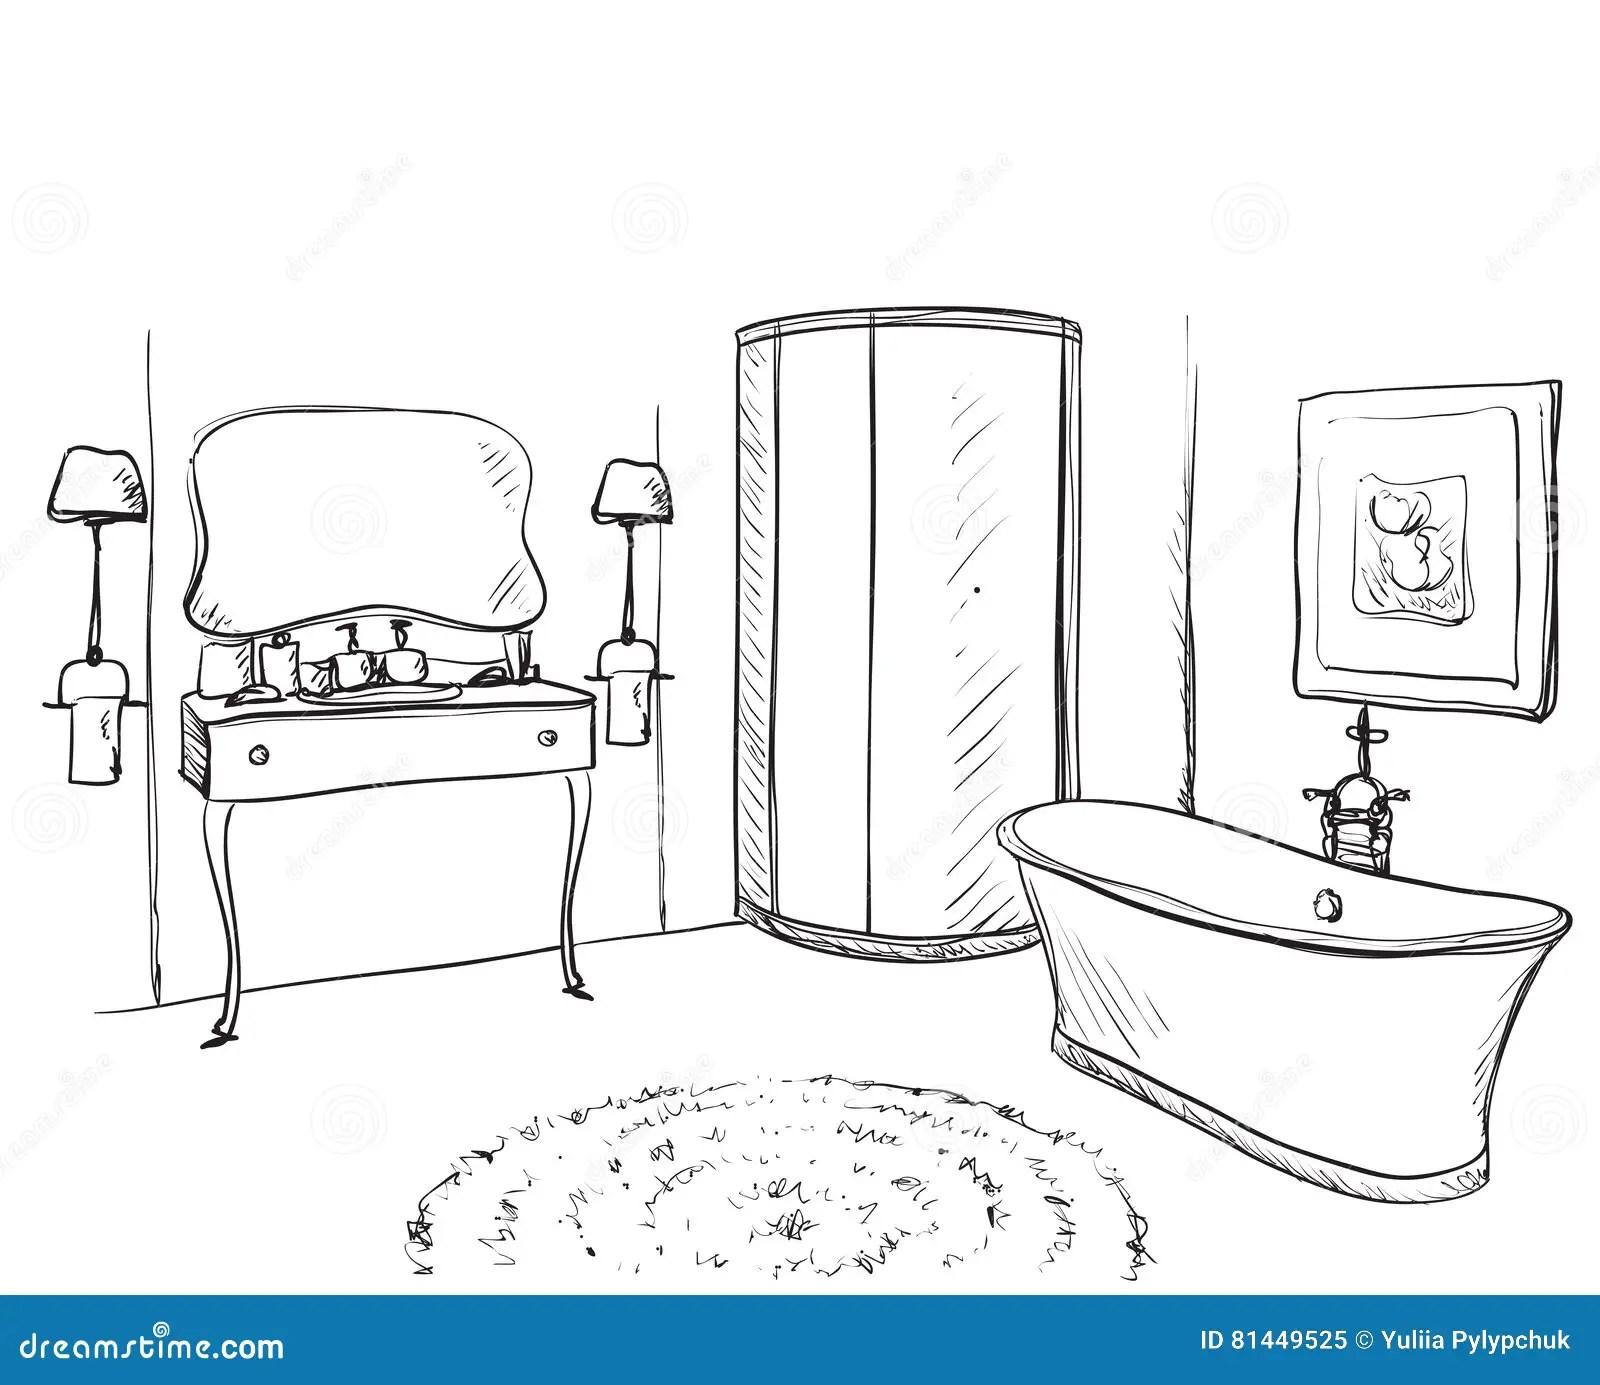 Hand Drawn Bathroom Furniture Sketch Stock Vector